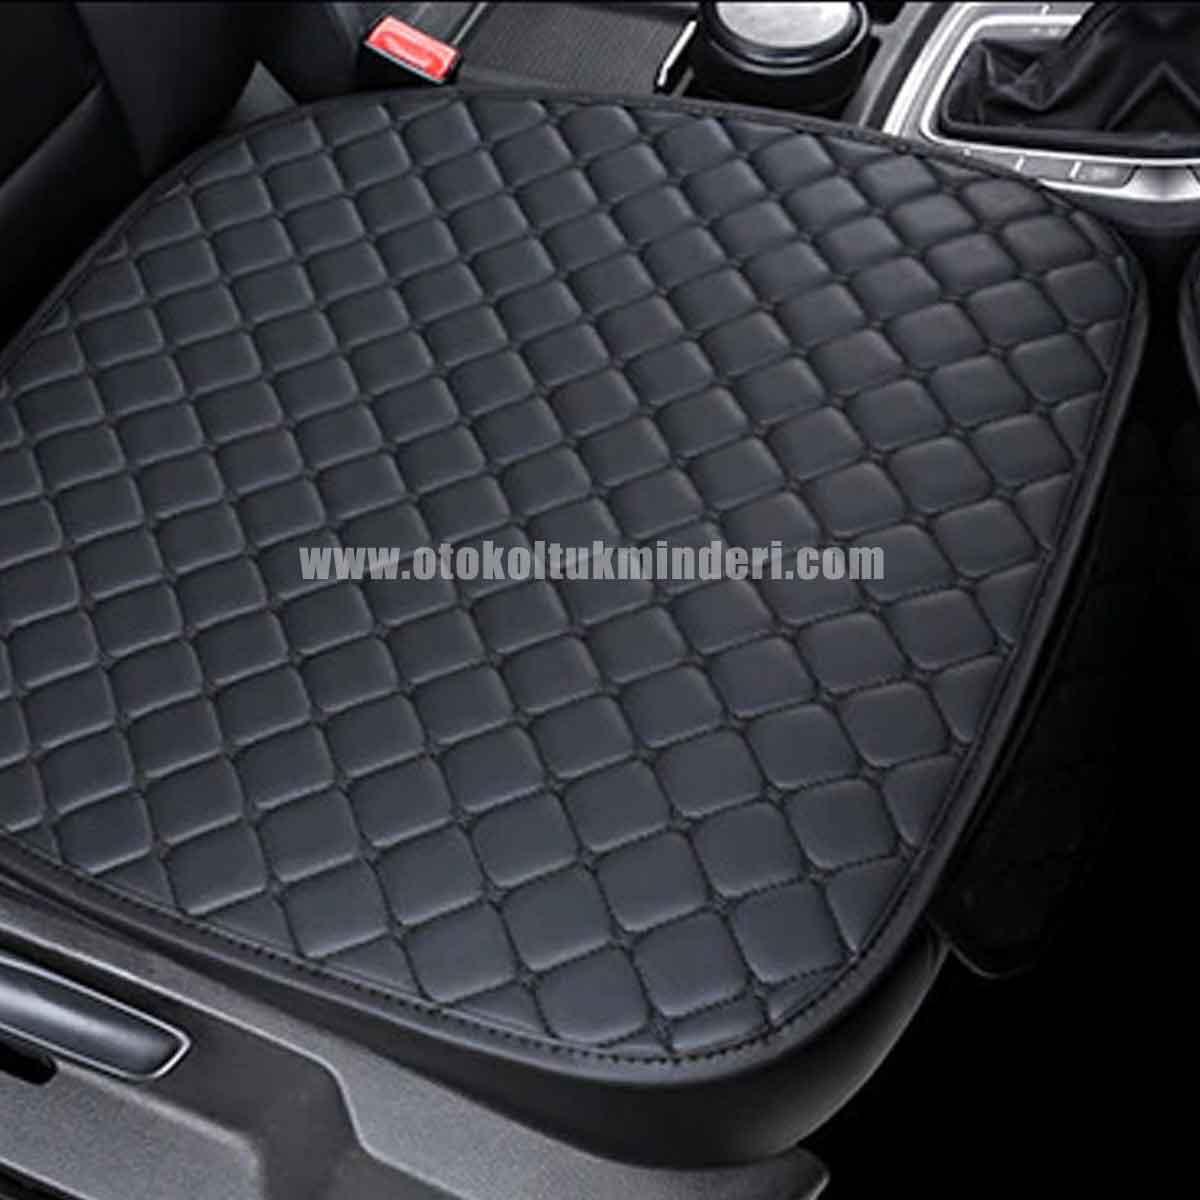 Peugeot oto koltuk kılıfı - Peugeot Koltuk minderi Siyah Deri Cepli